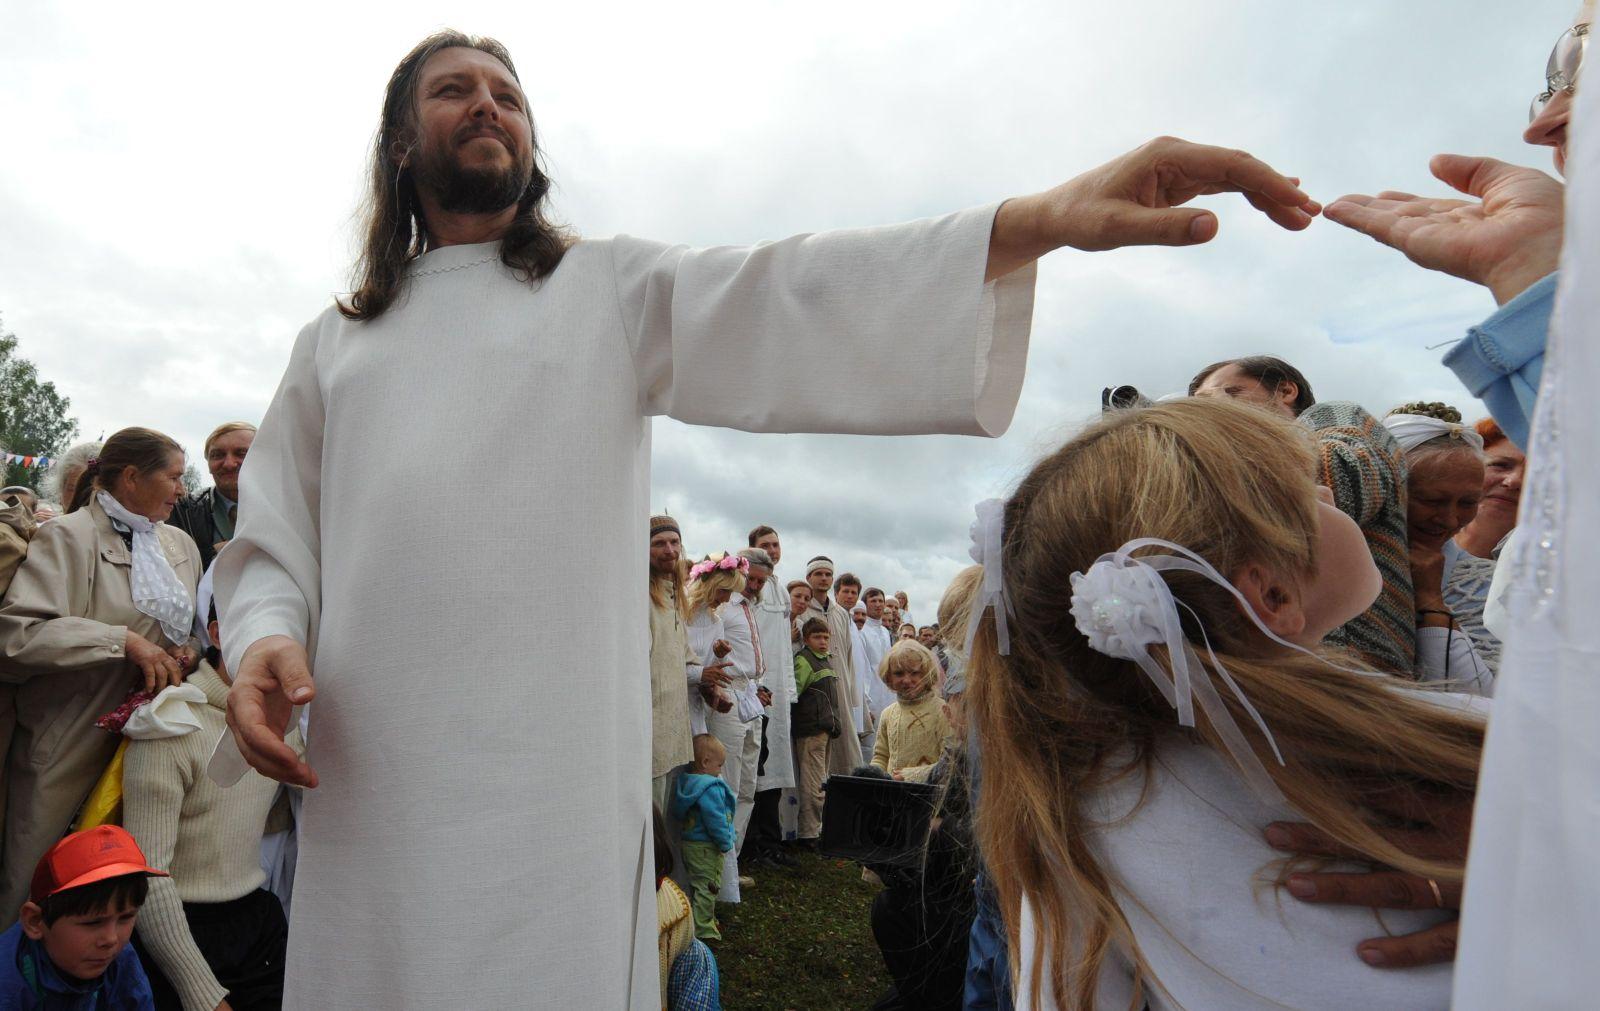 FILES-RUSSIA-RELIGION-SOCIAL-ARREST